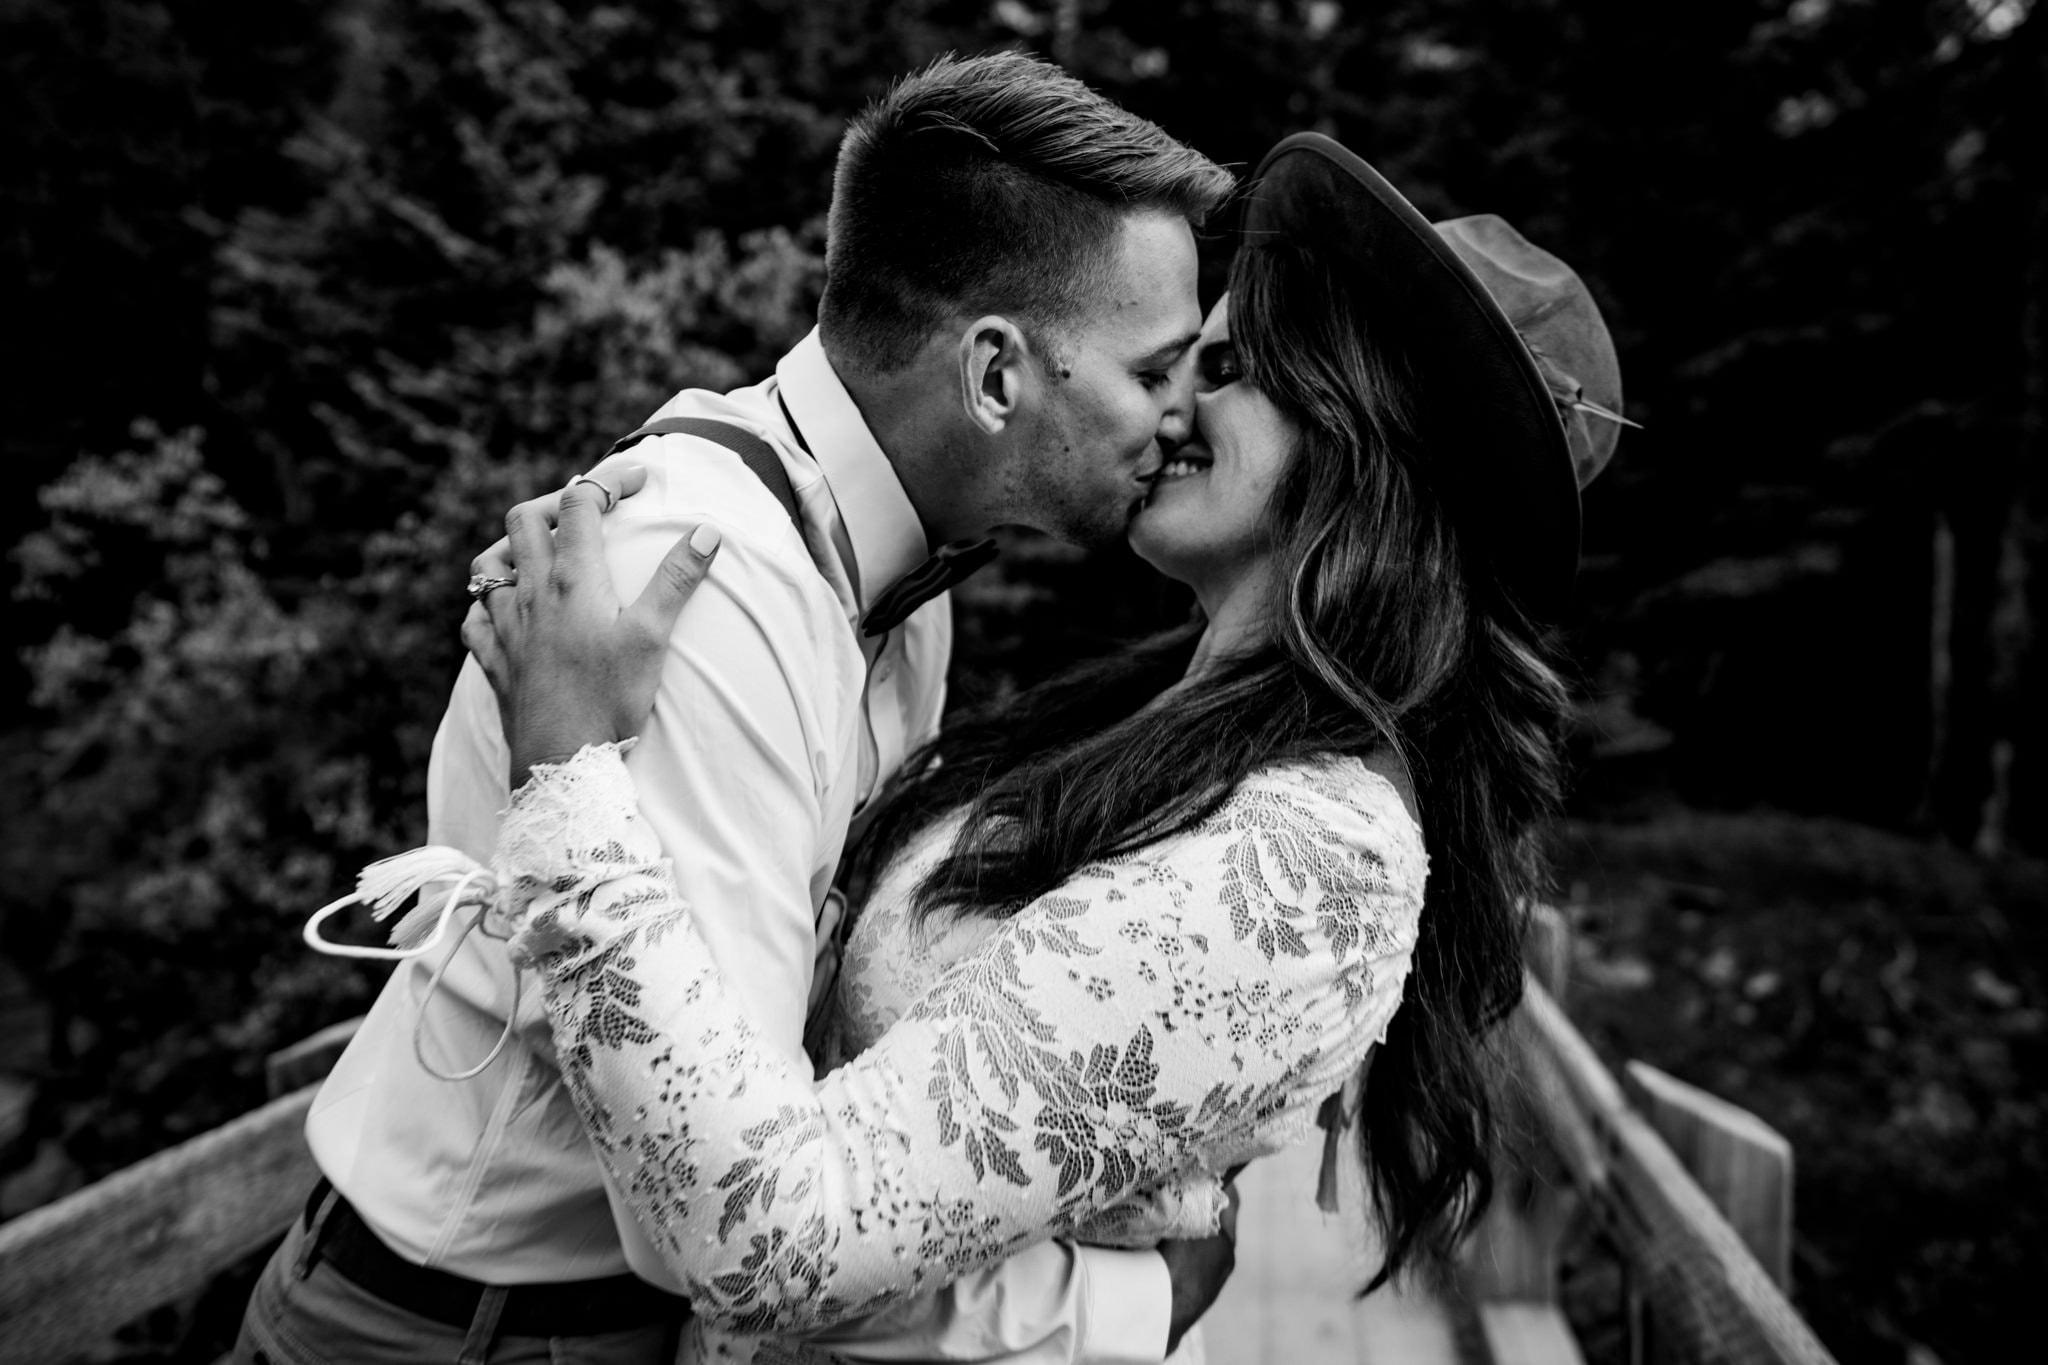 Studio 22 Photography - Romantic Engagement Photos